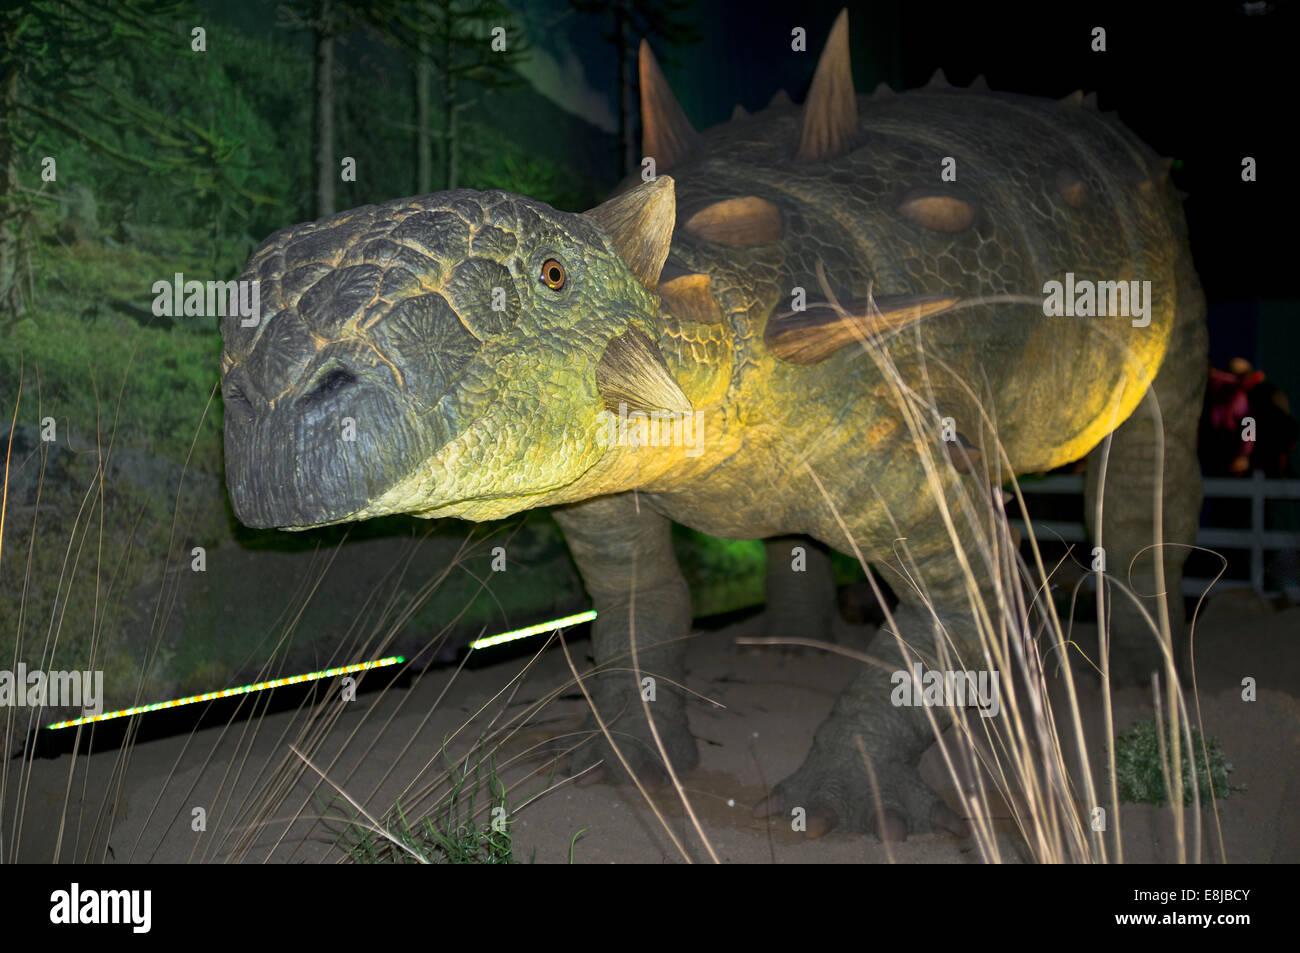 dh Euoplocephalus PREHISTORIC ANIMAL Extinct north american dinosaur herbivore - Stock Image